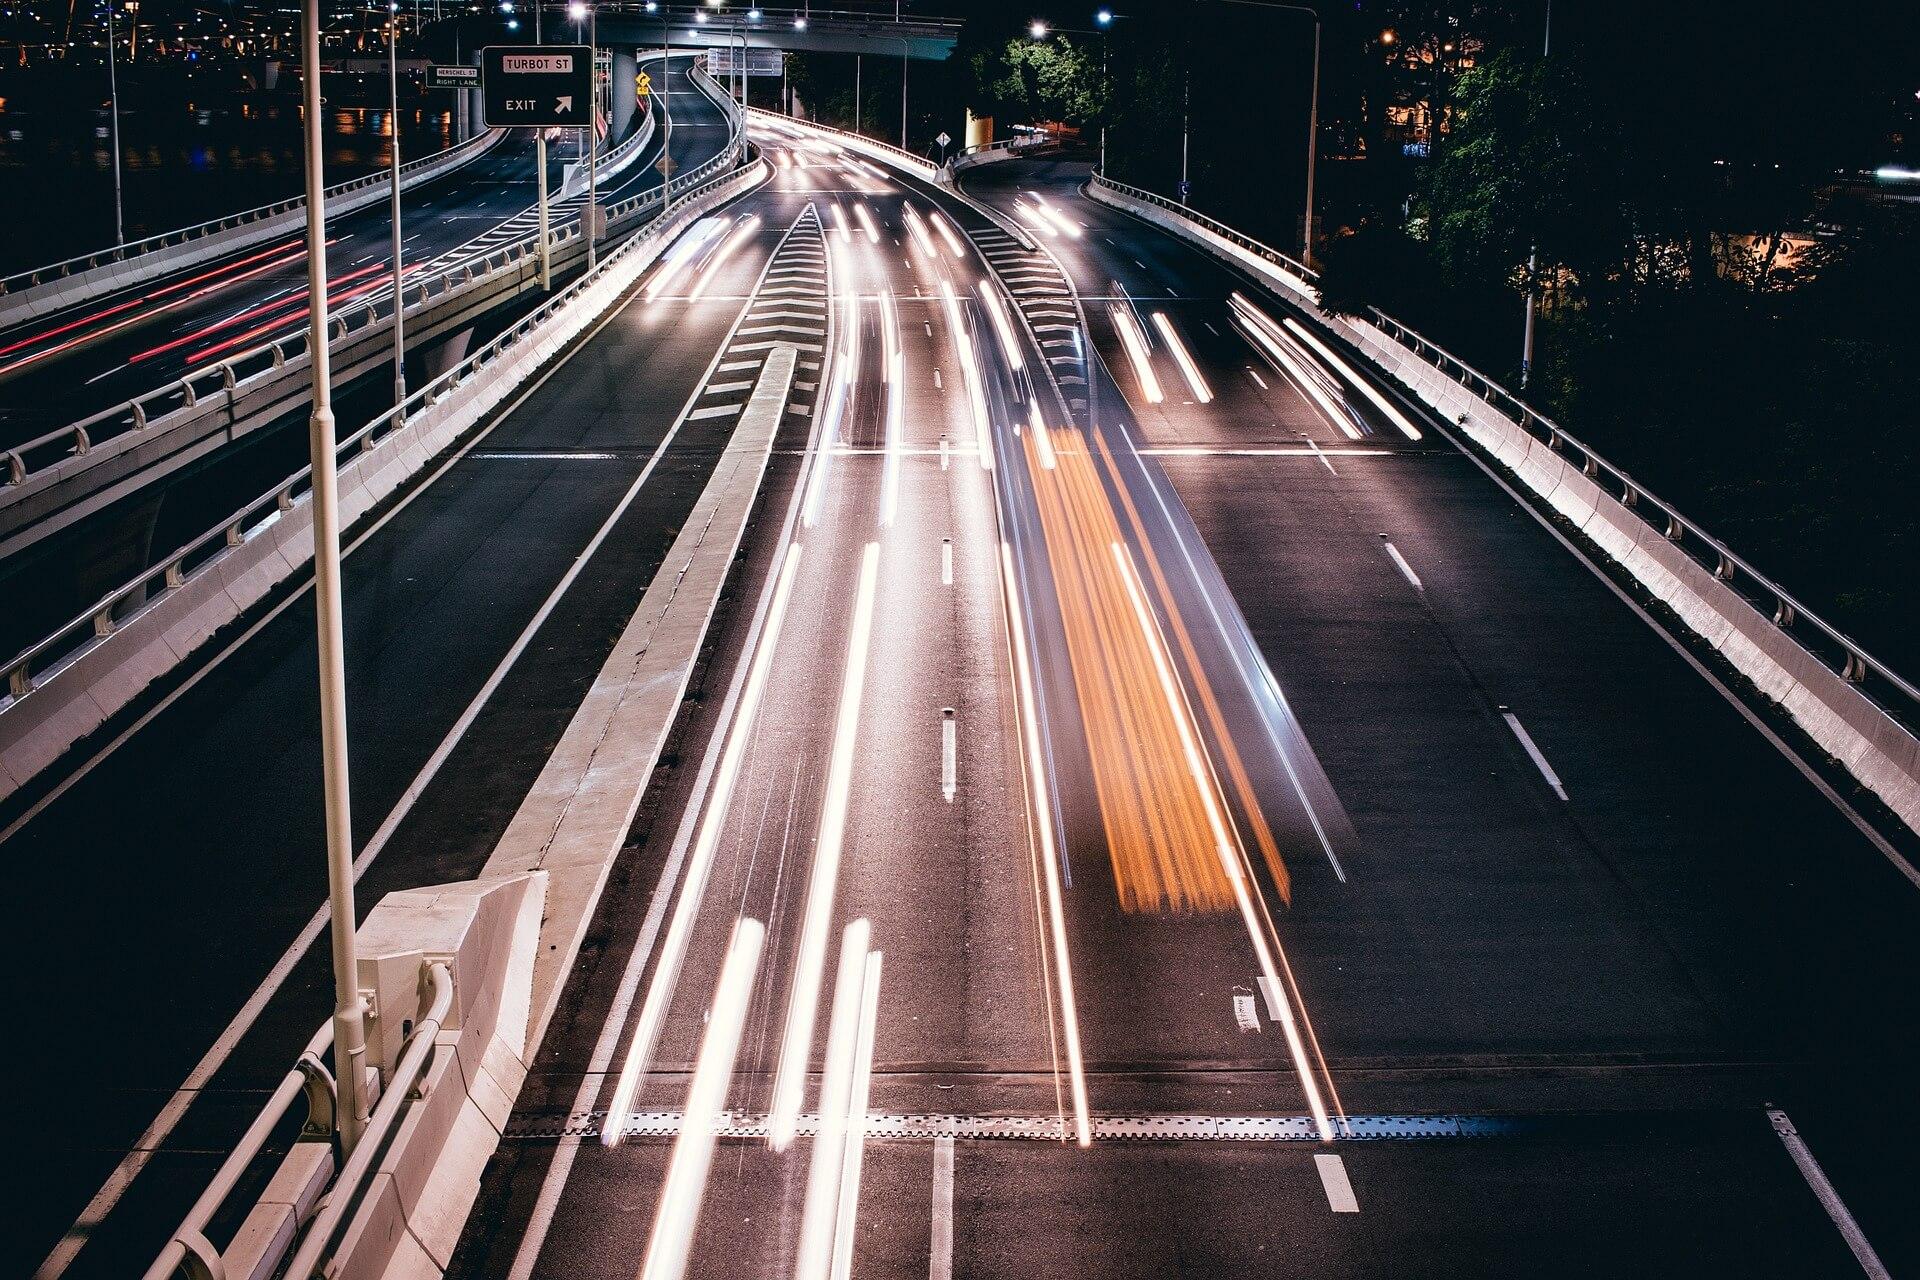 Schritte autonomes Fahren